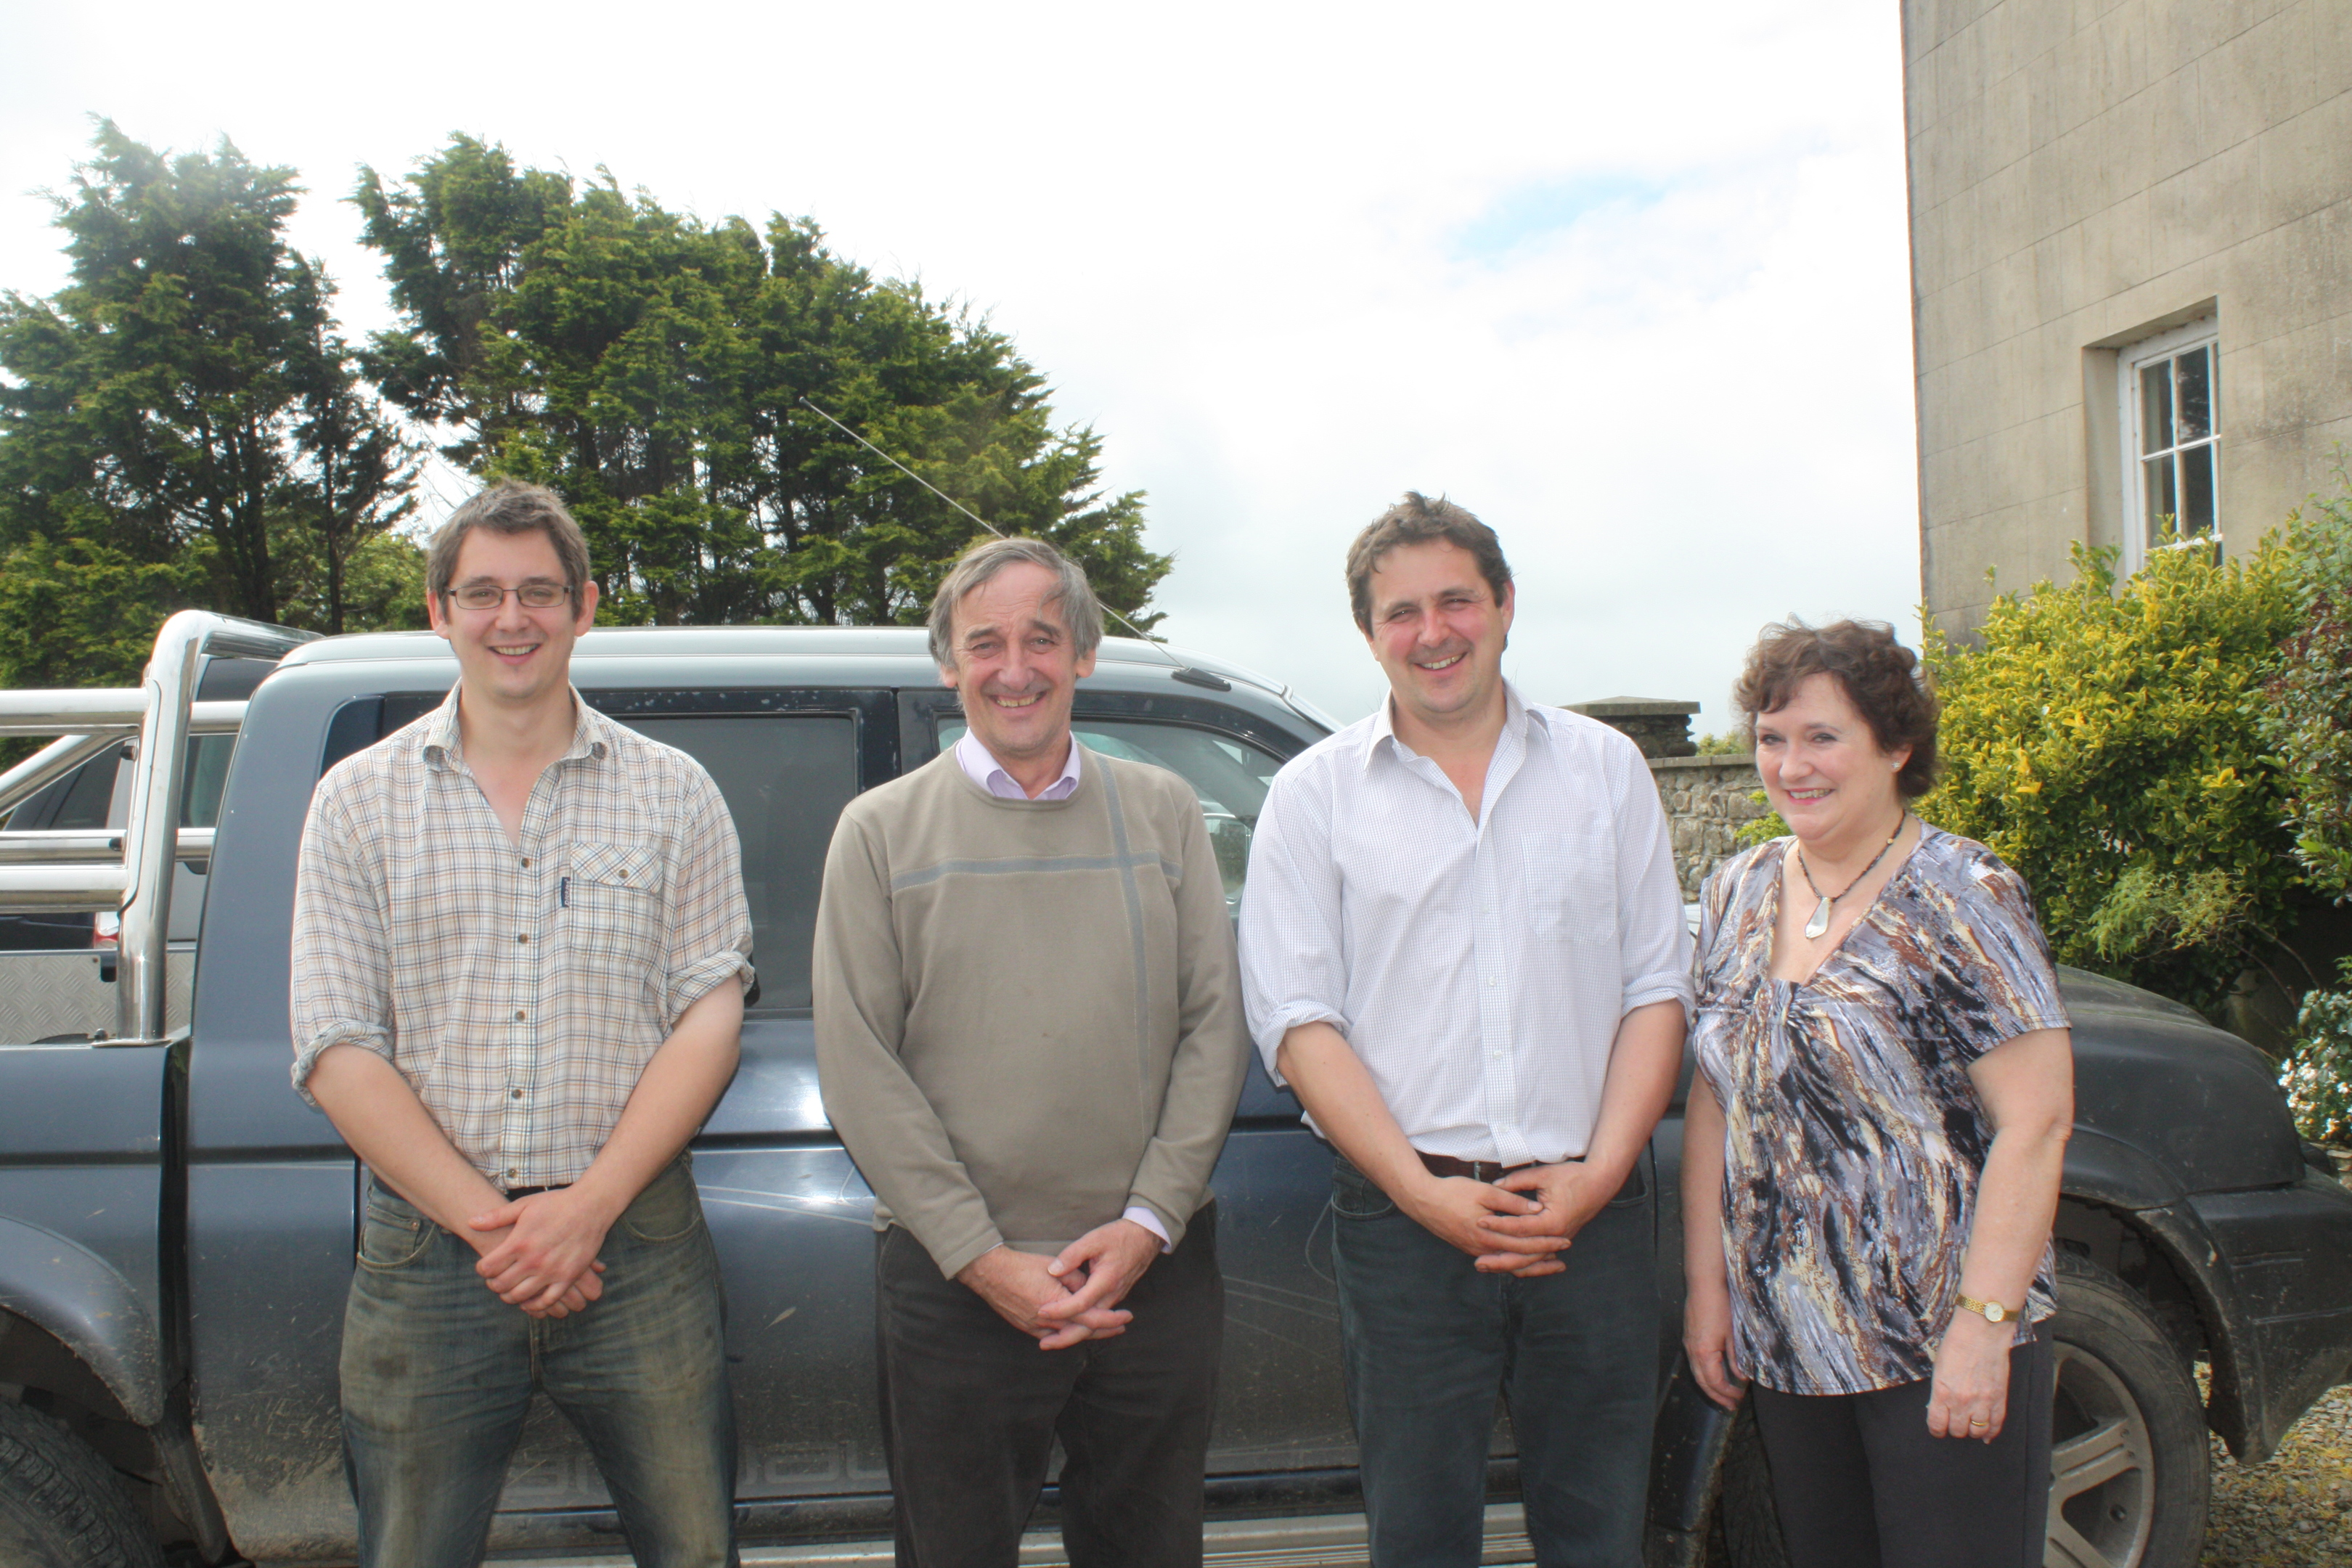 Nigel, Mansel, Paul and Hilary Raymond.